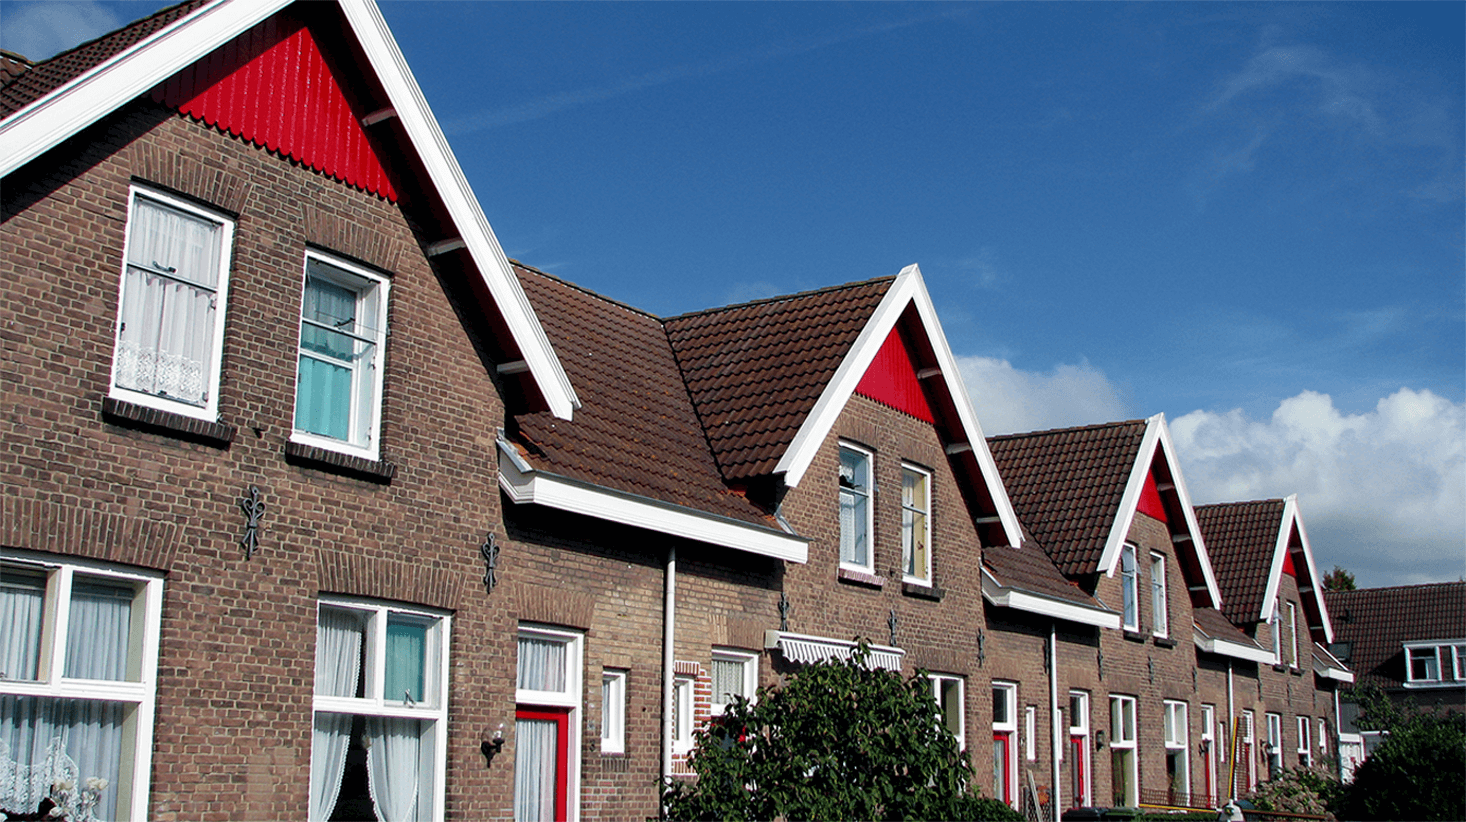 Makelaar die woningen opkoopt